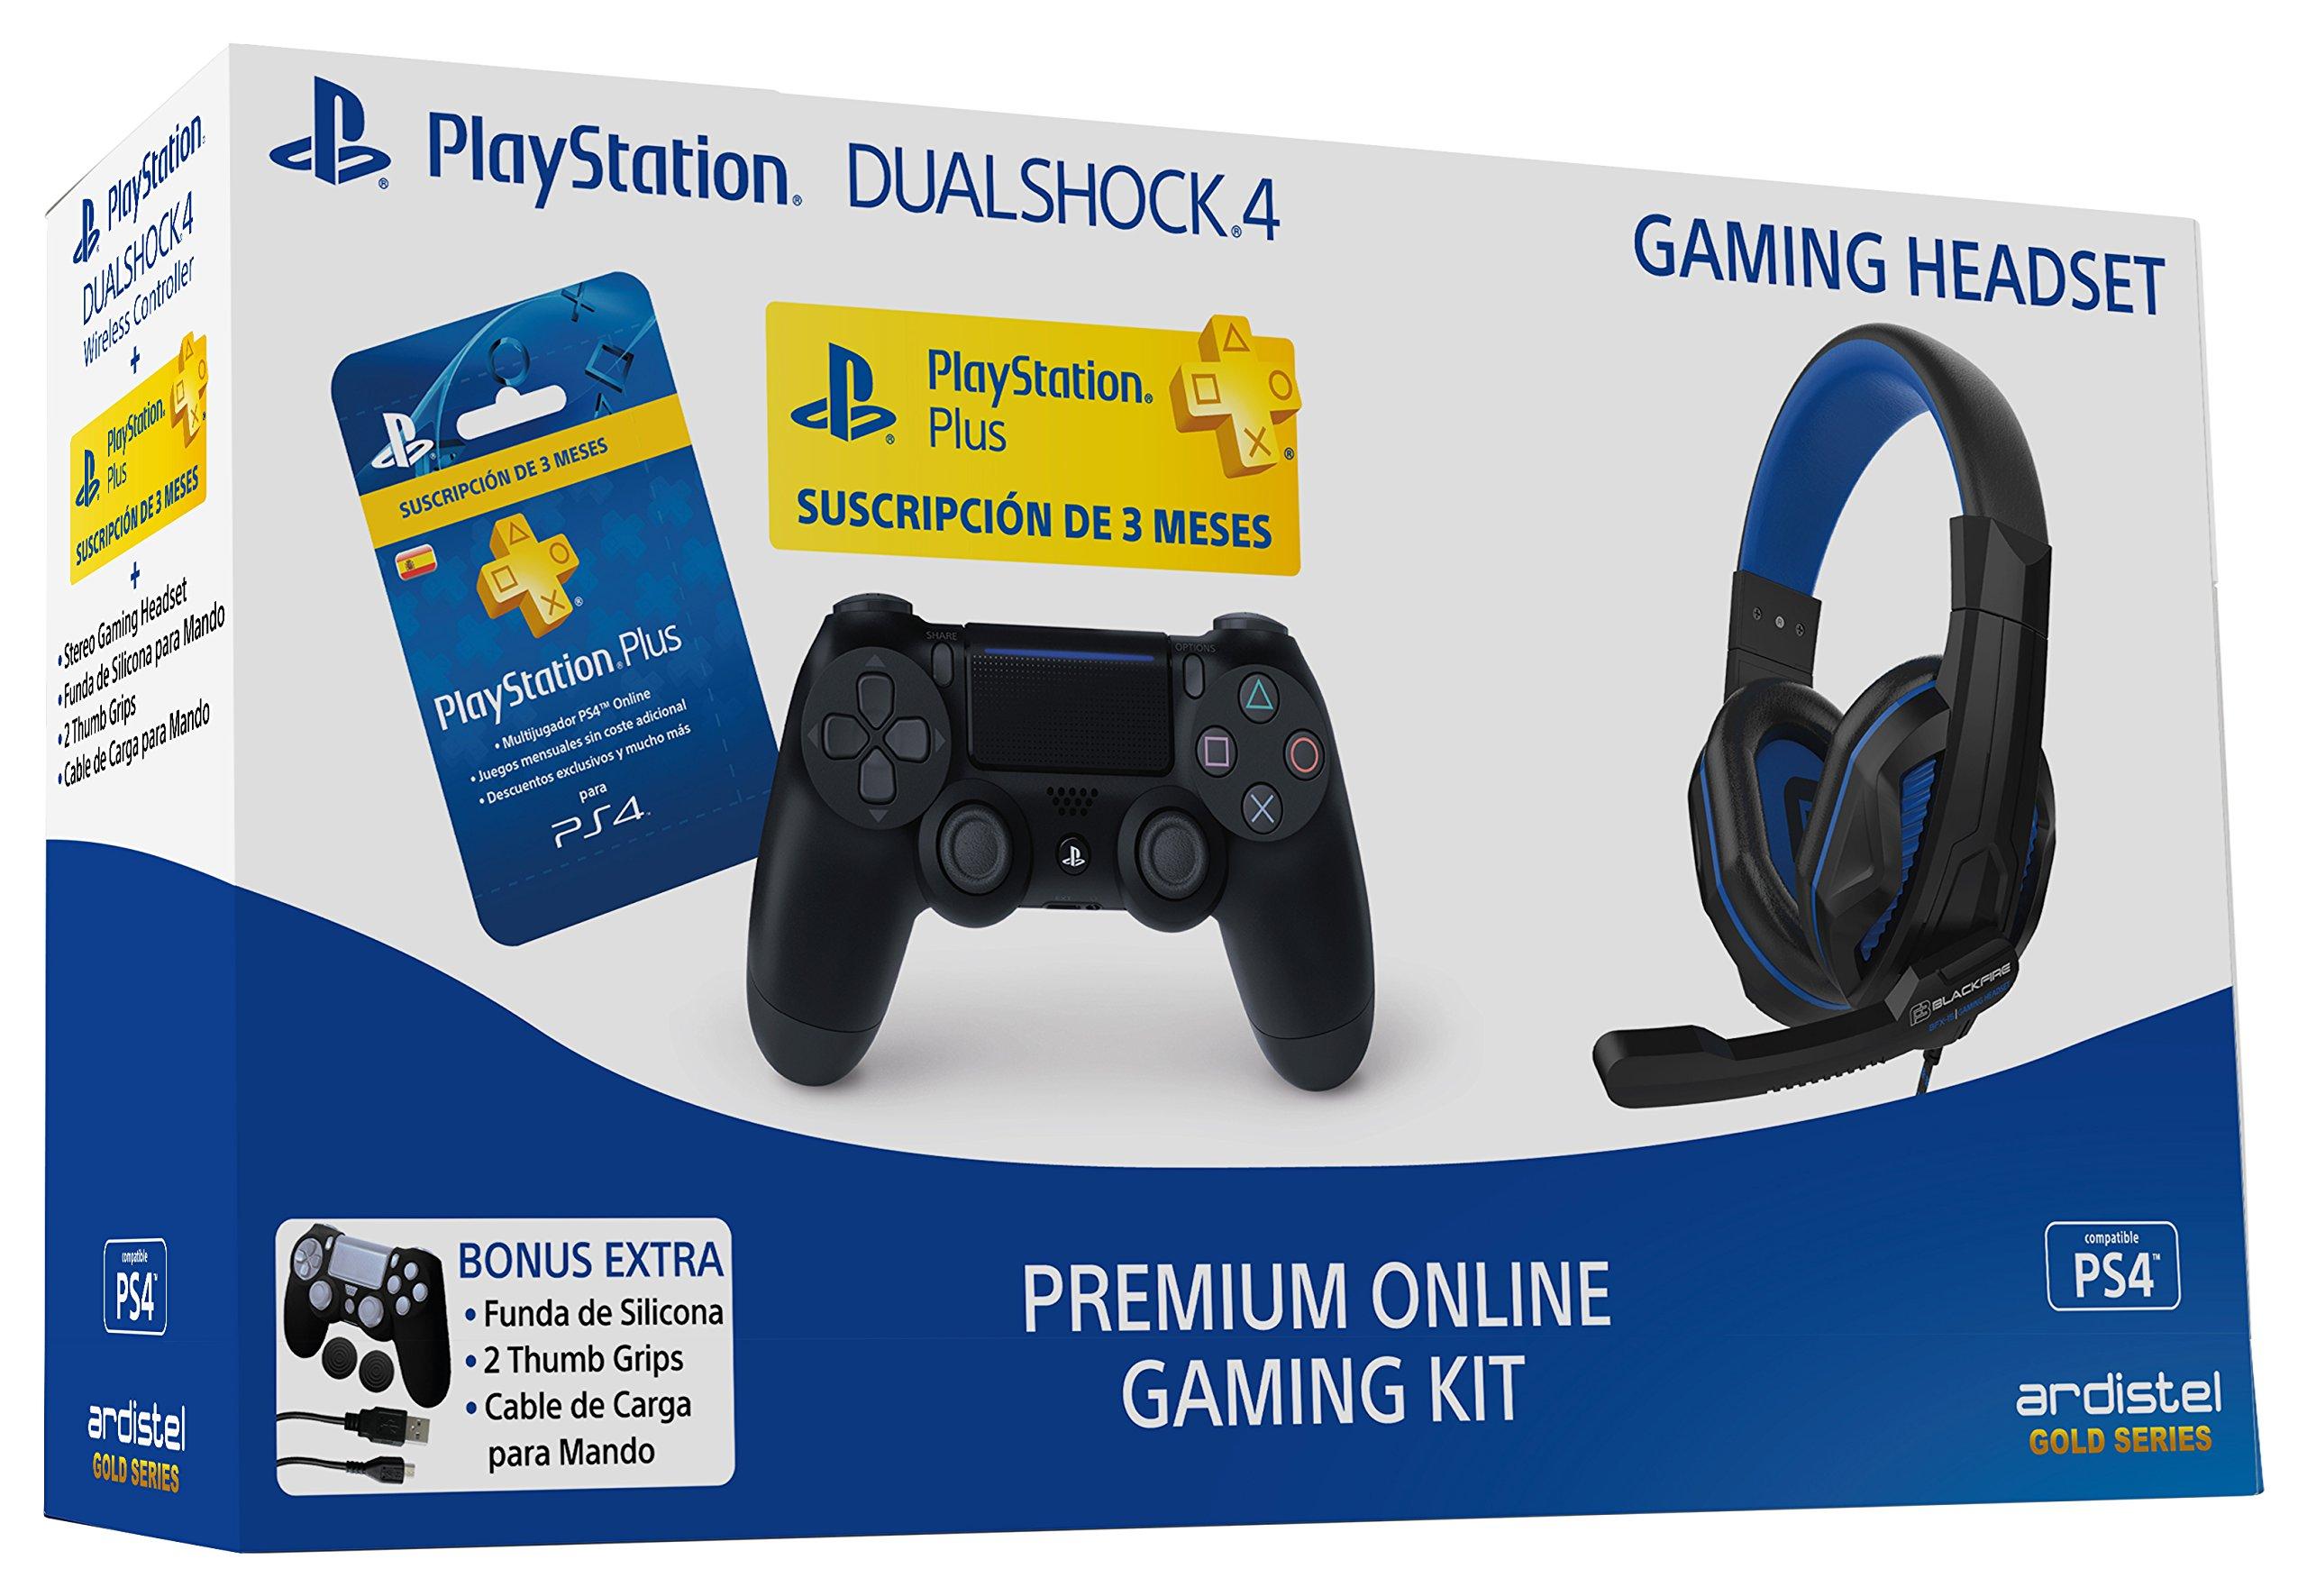 Ardistel - Premium Online Gaming Kit (PS4) - Mando Dualshock 4 V2 ...